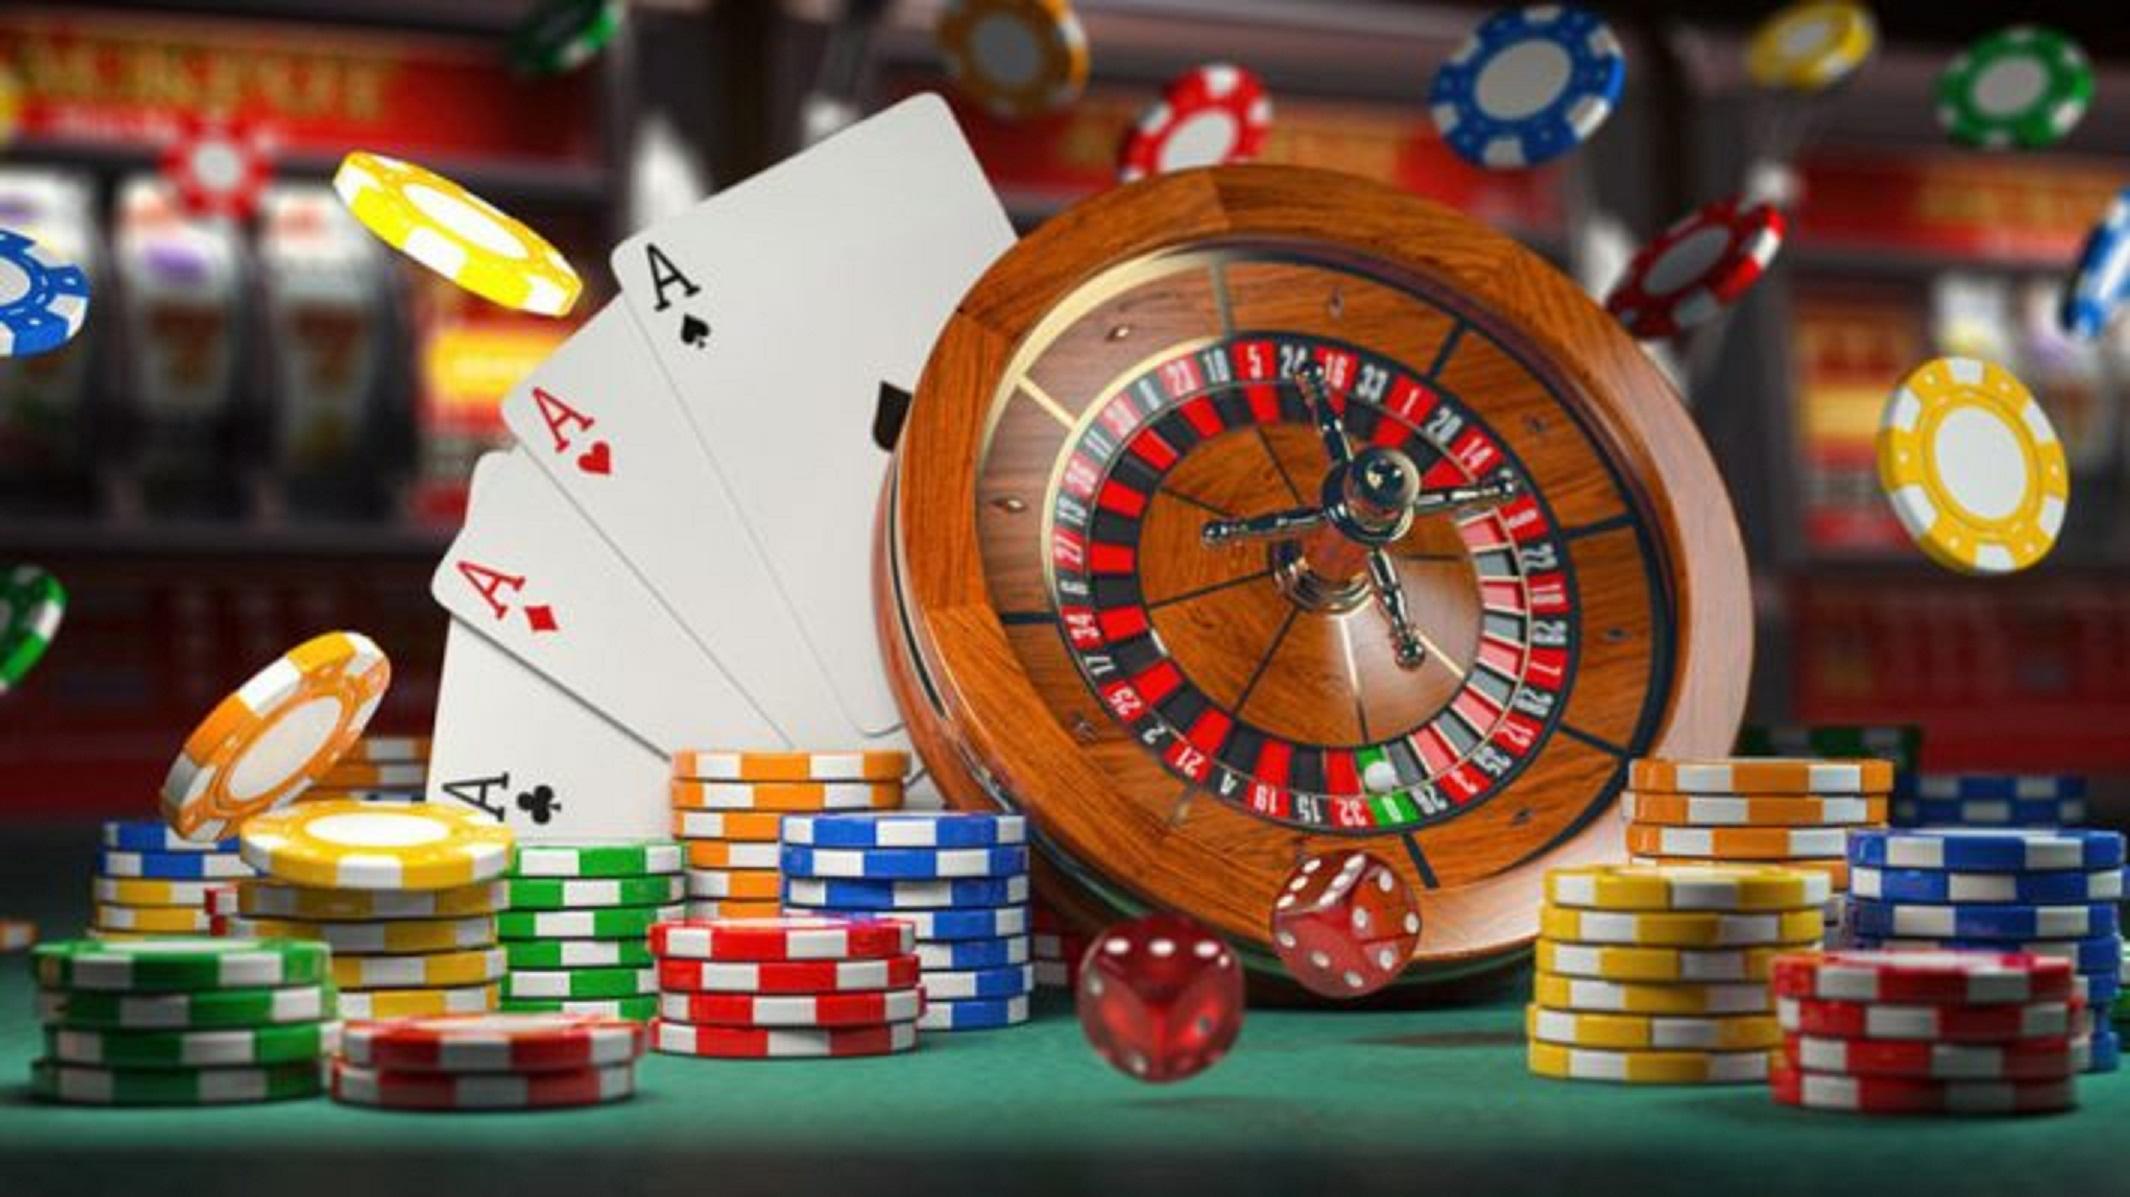 Casino en ligne en belgique comment y acceder ?